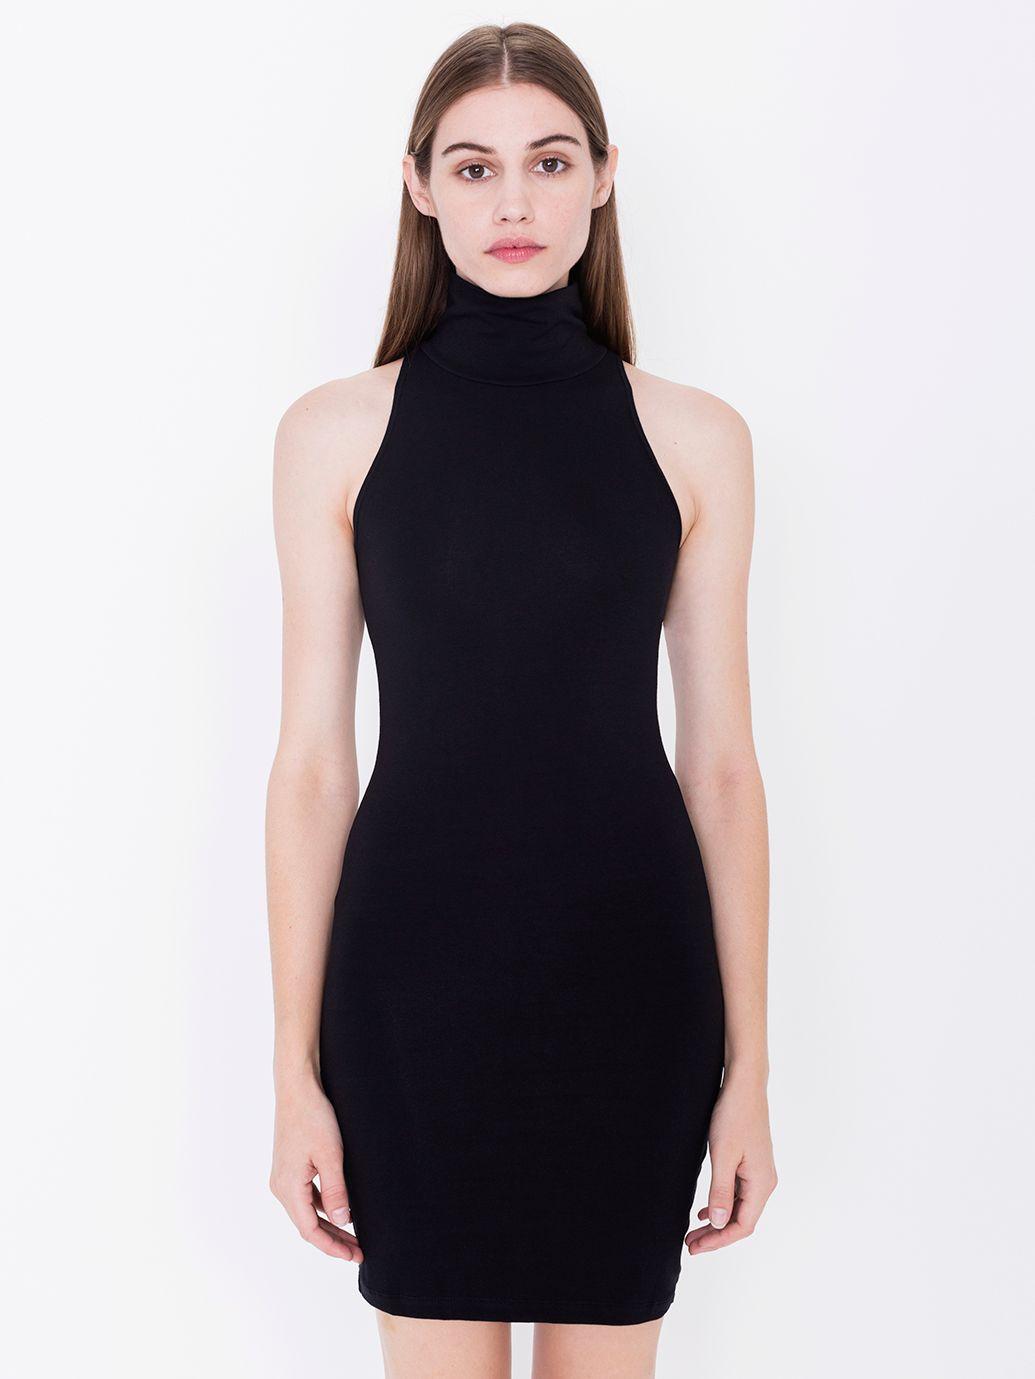 Cotton Spandex Jersey Sleeveless Turtleneck Dress